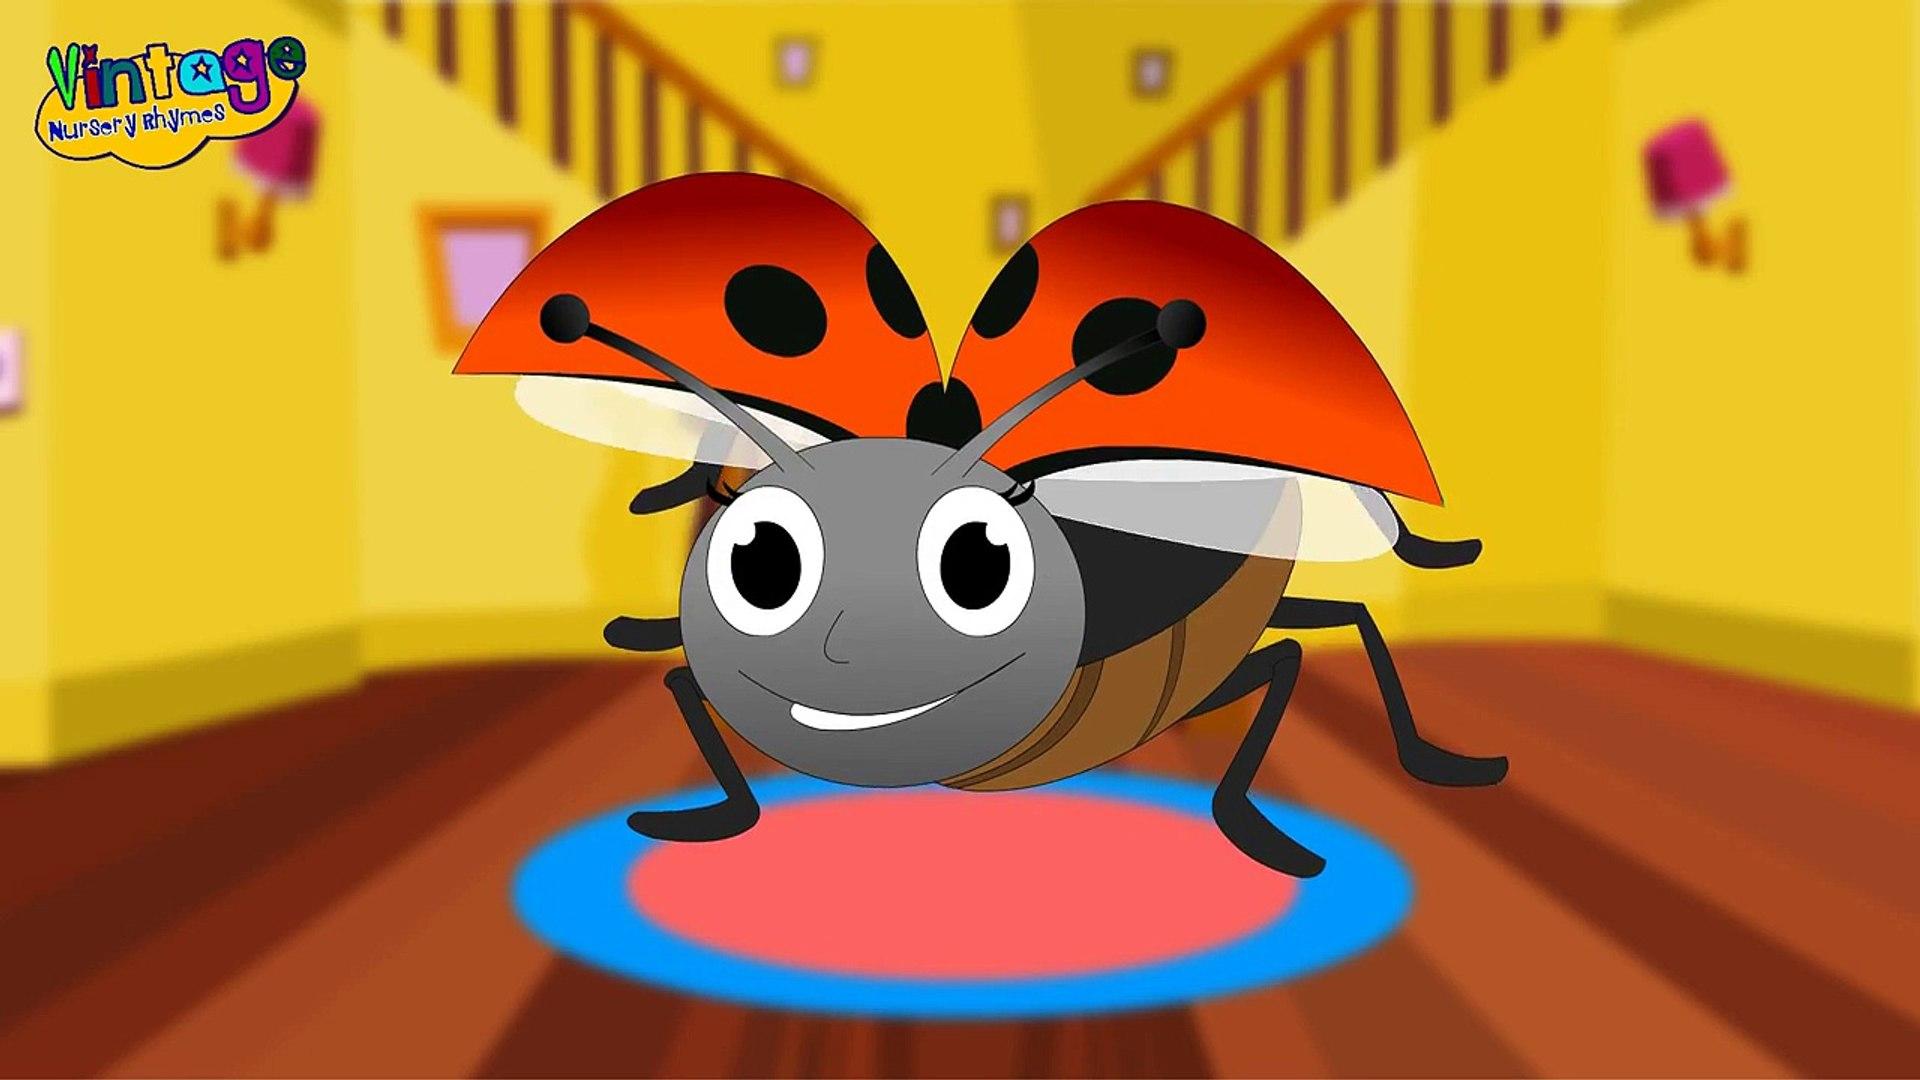 Lady Bug Lady Bug Fly Away Home Song | Childrens Nursery Rhyme With Lyrics | English Nursery Rhymes